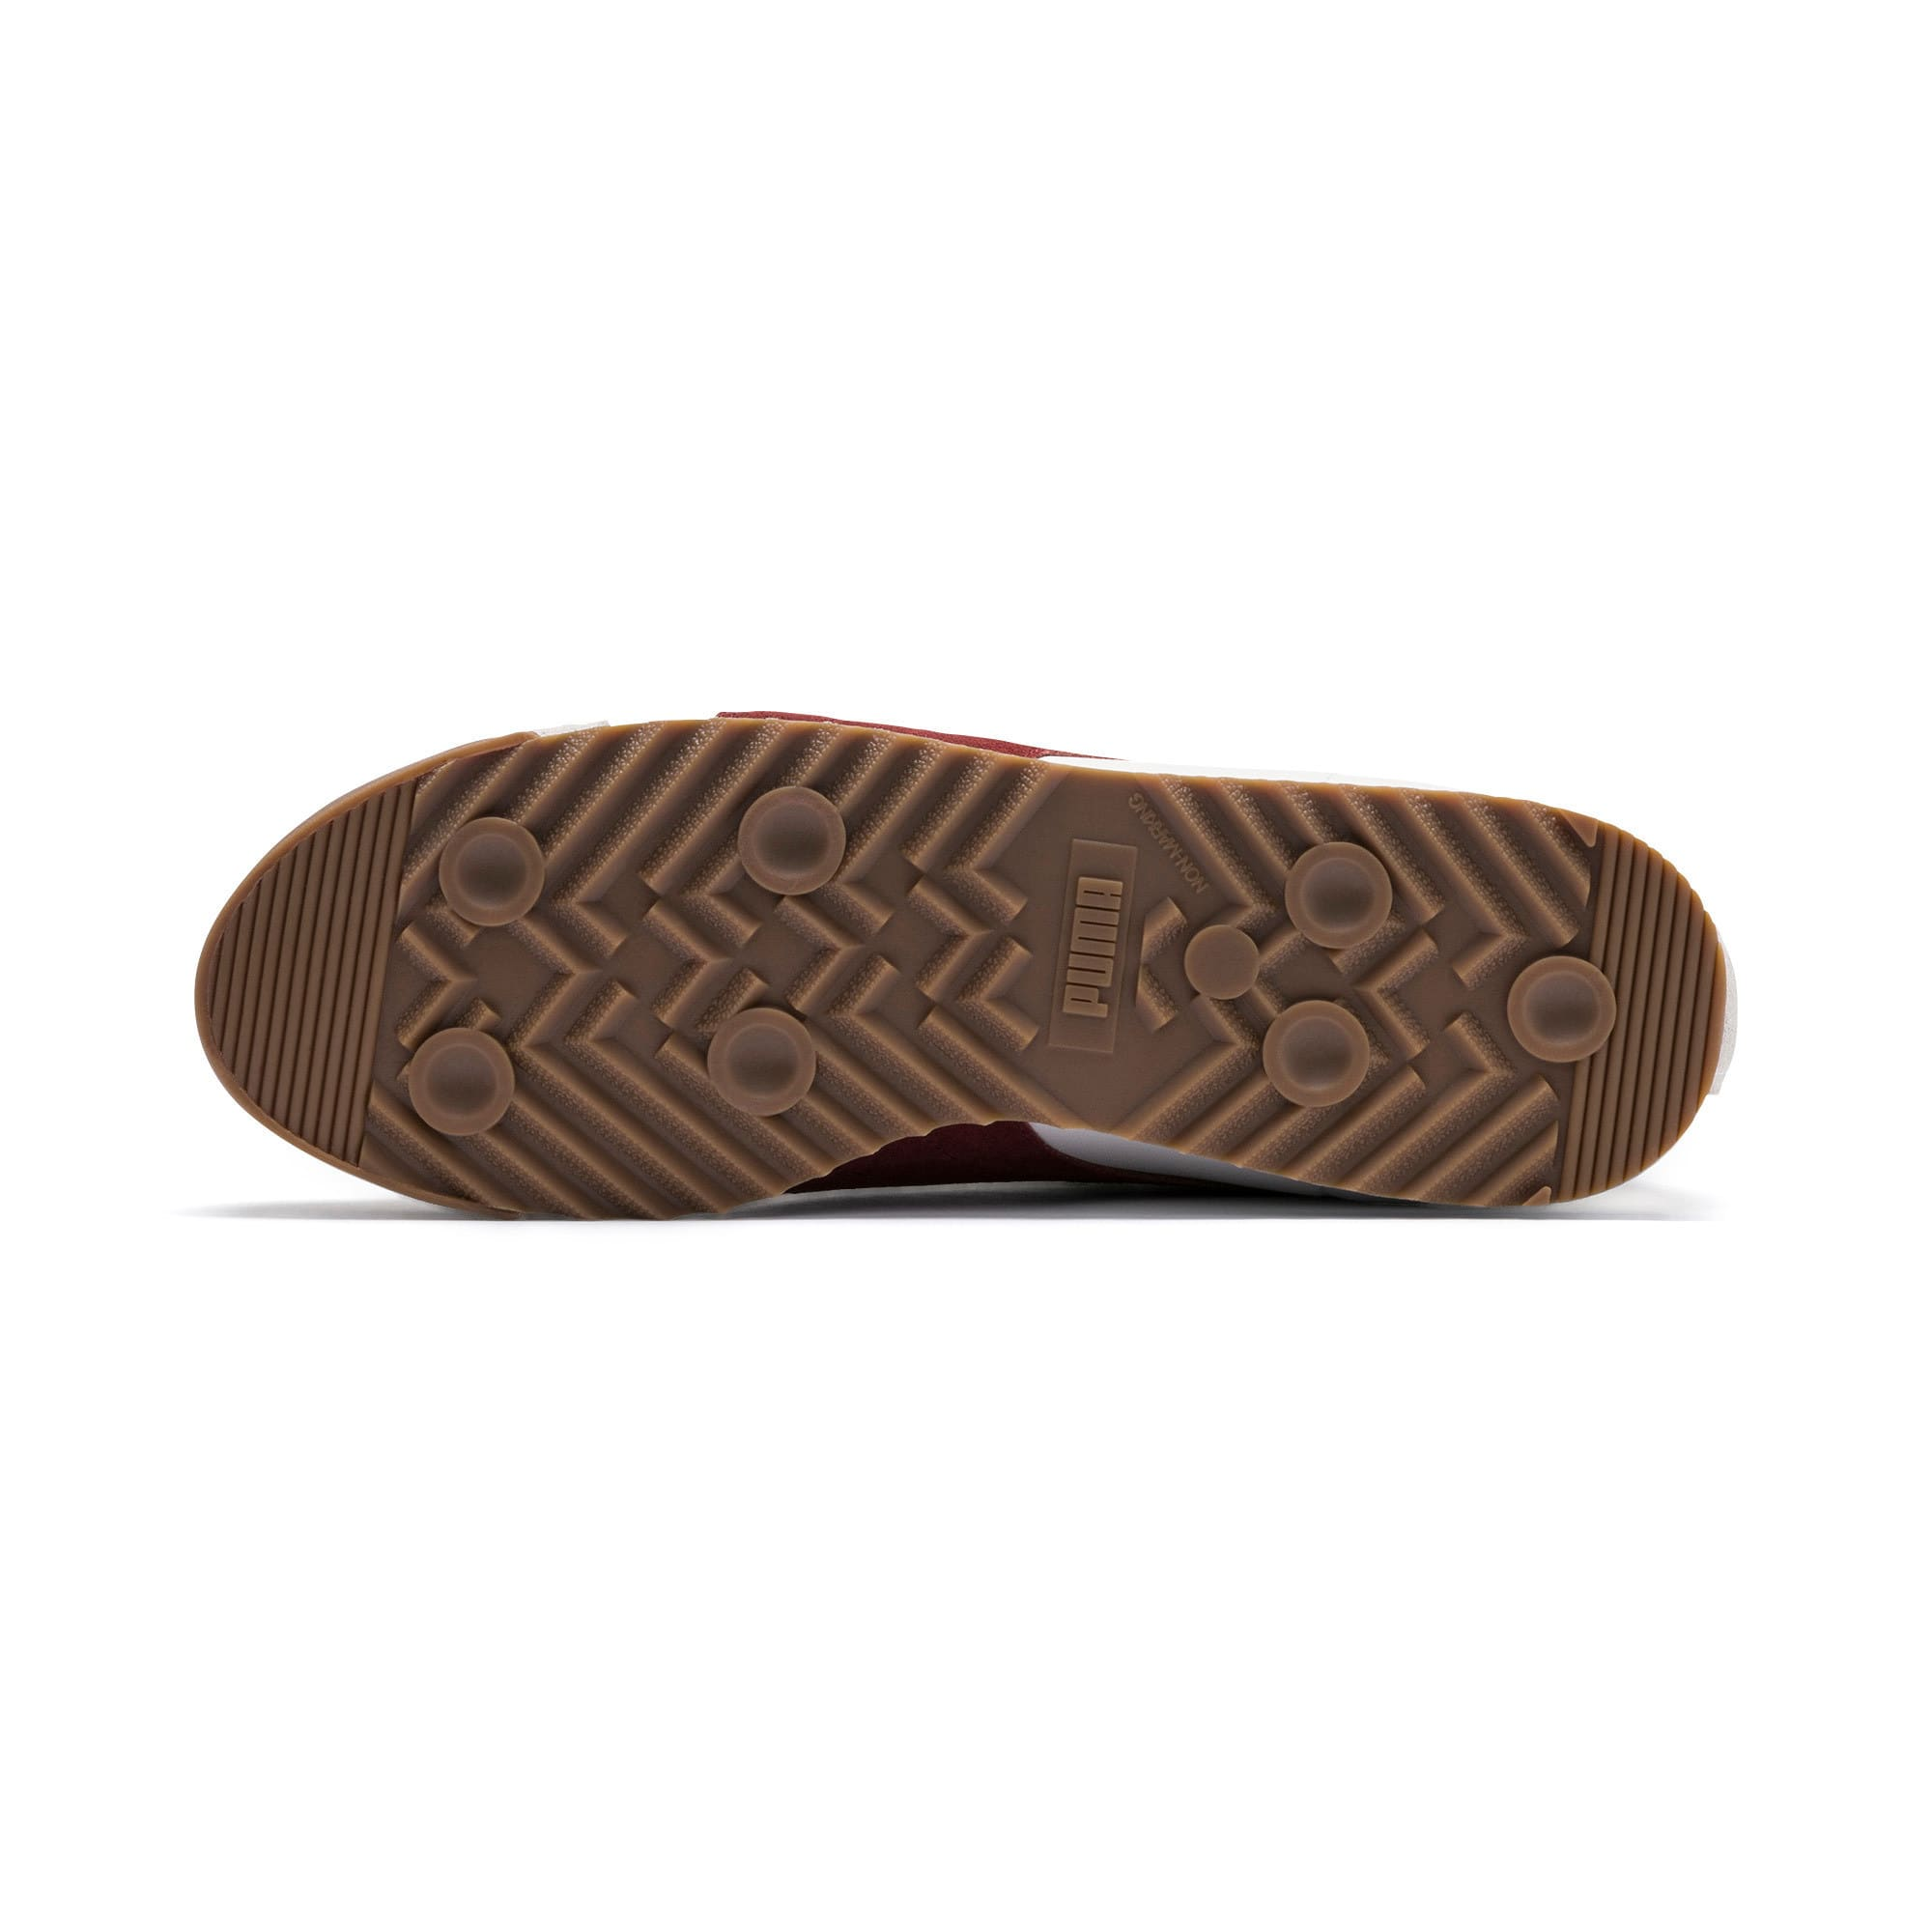 Thumbnail 6 of PUMA x TYAKASHA Roma Sneakers, Marshmallow-Fired Brick, medium